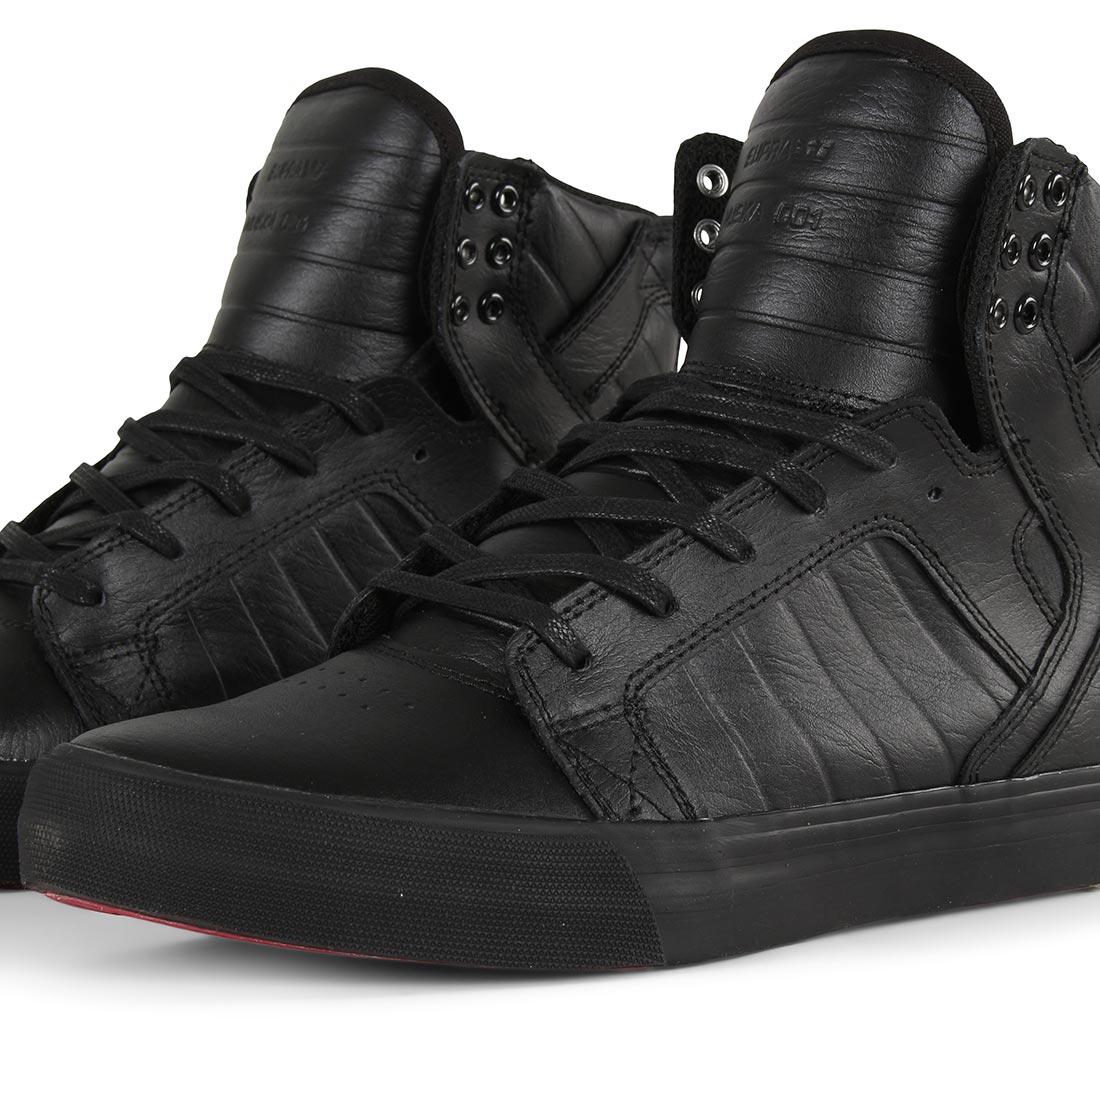 Supra Skytop Shoes - Black / Black